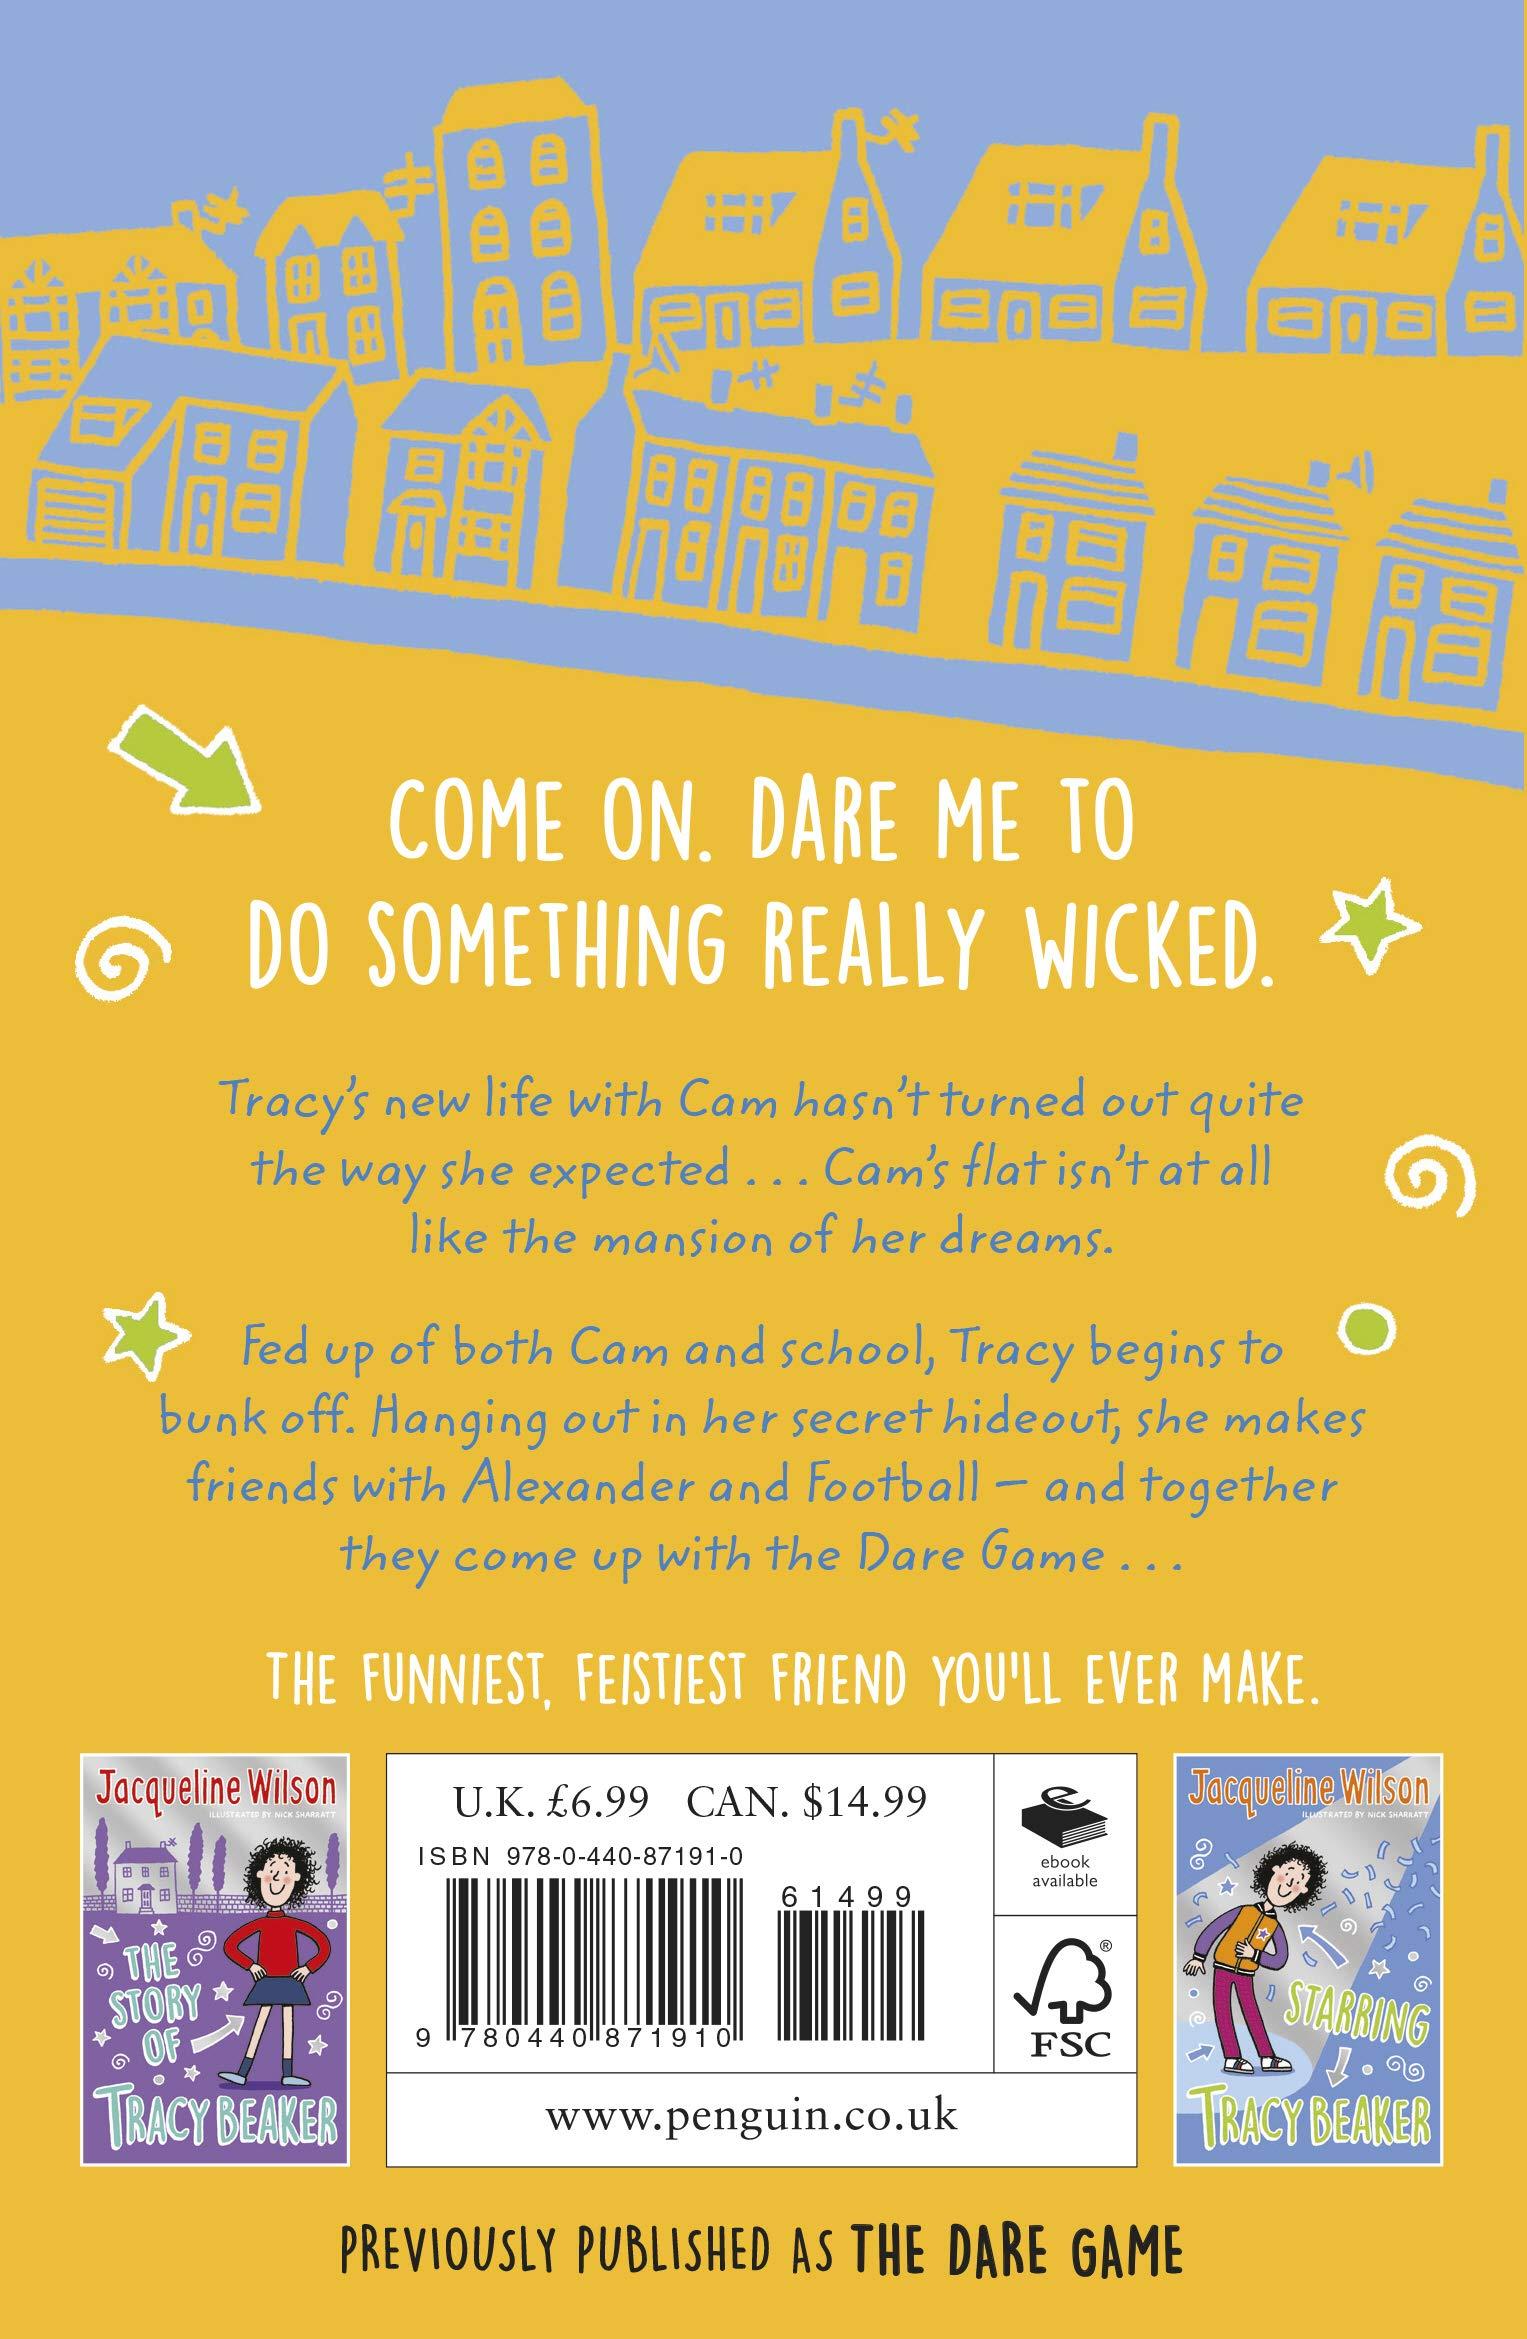 I Dare You, Tracy Beaker: Originally published as The Dare Game:  Amazon.co.uk: Jacqueline Wilson: Books